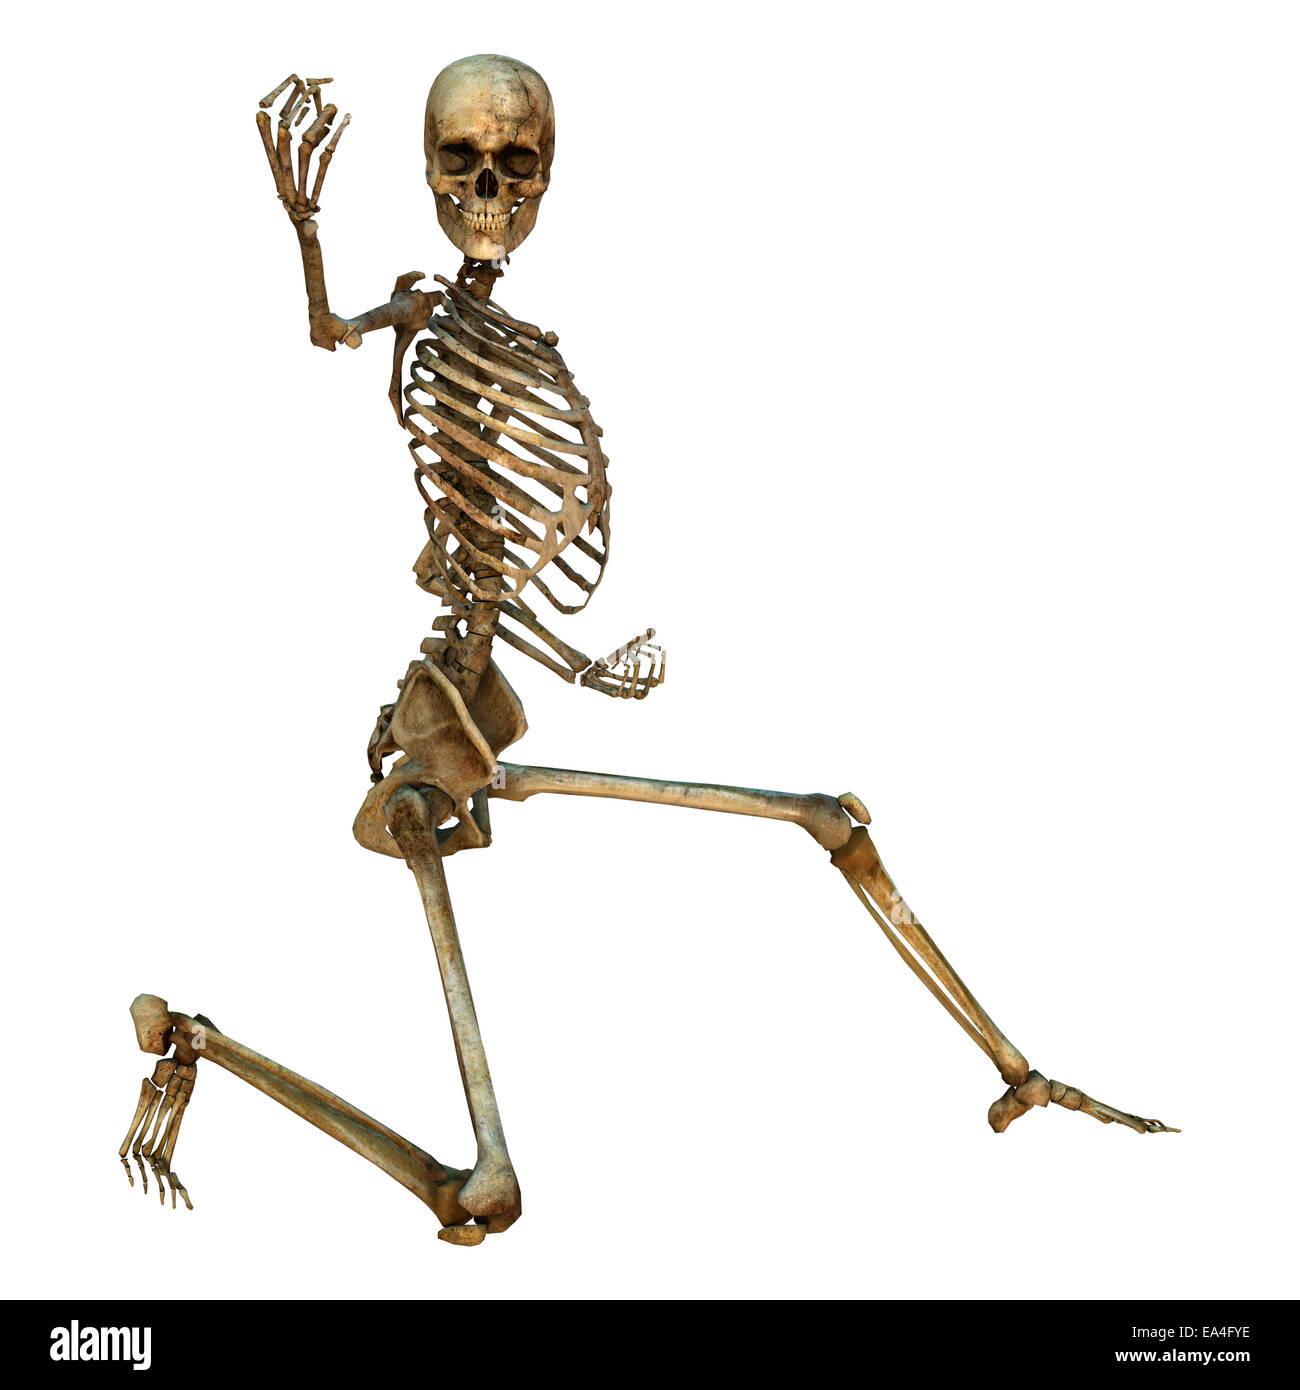 3d Digital Render Of A Human Skeleton In A Oi Zukii Gari Martial